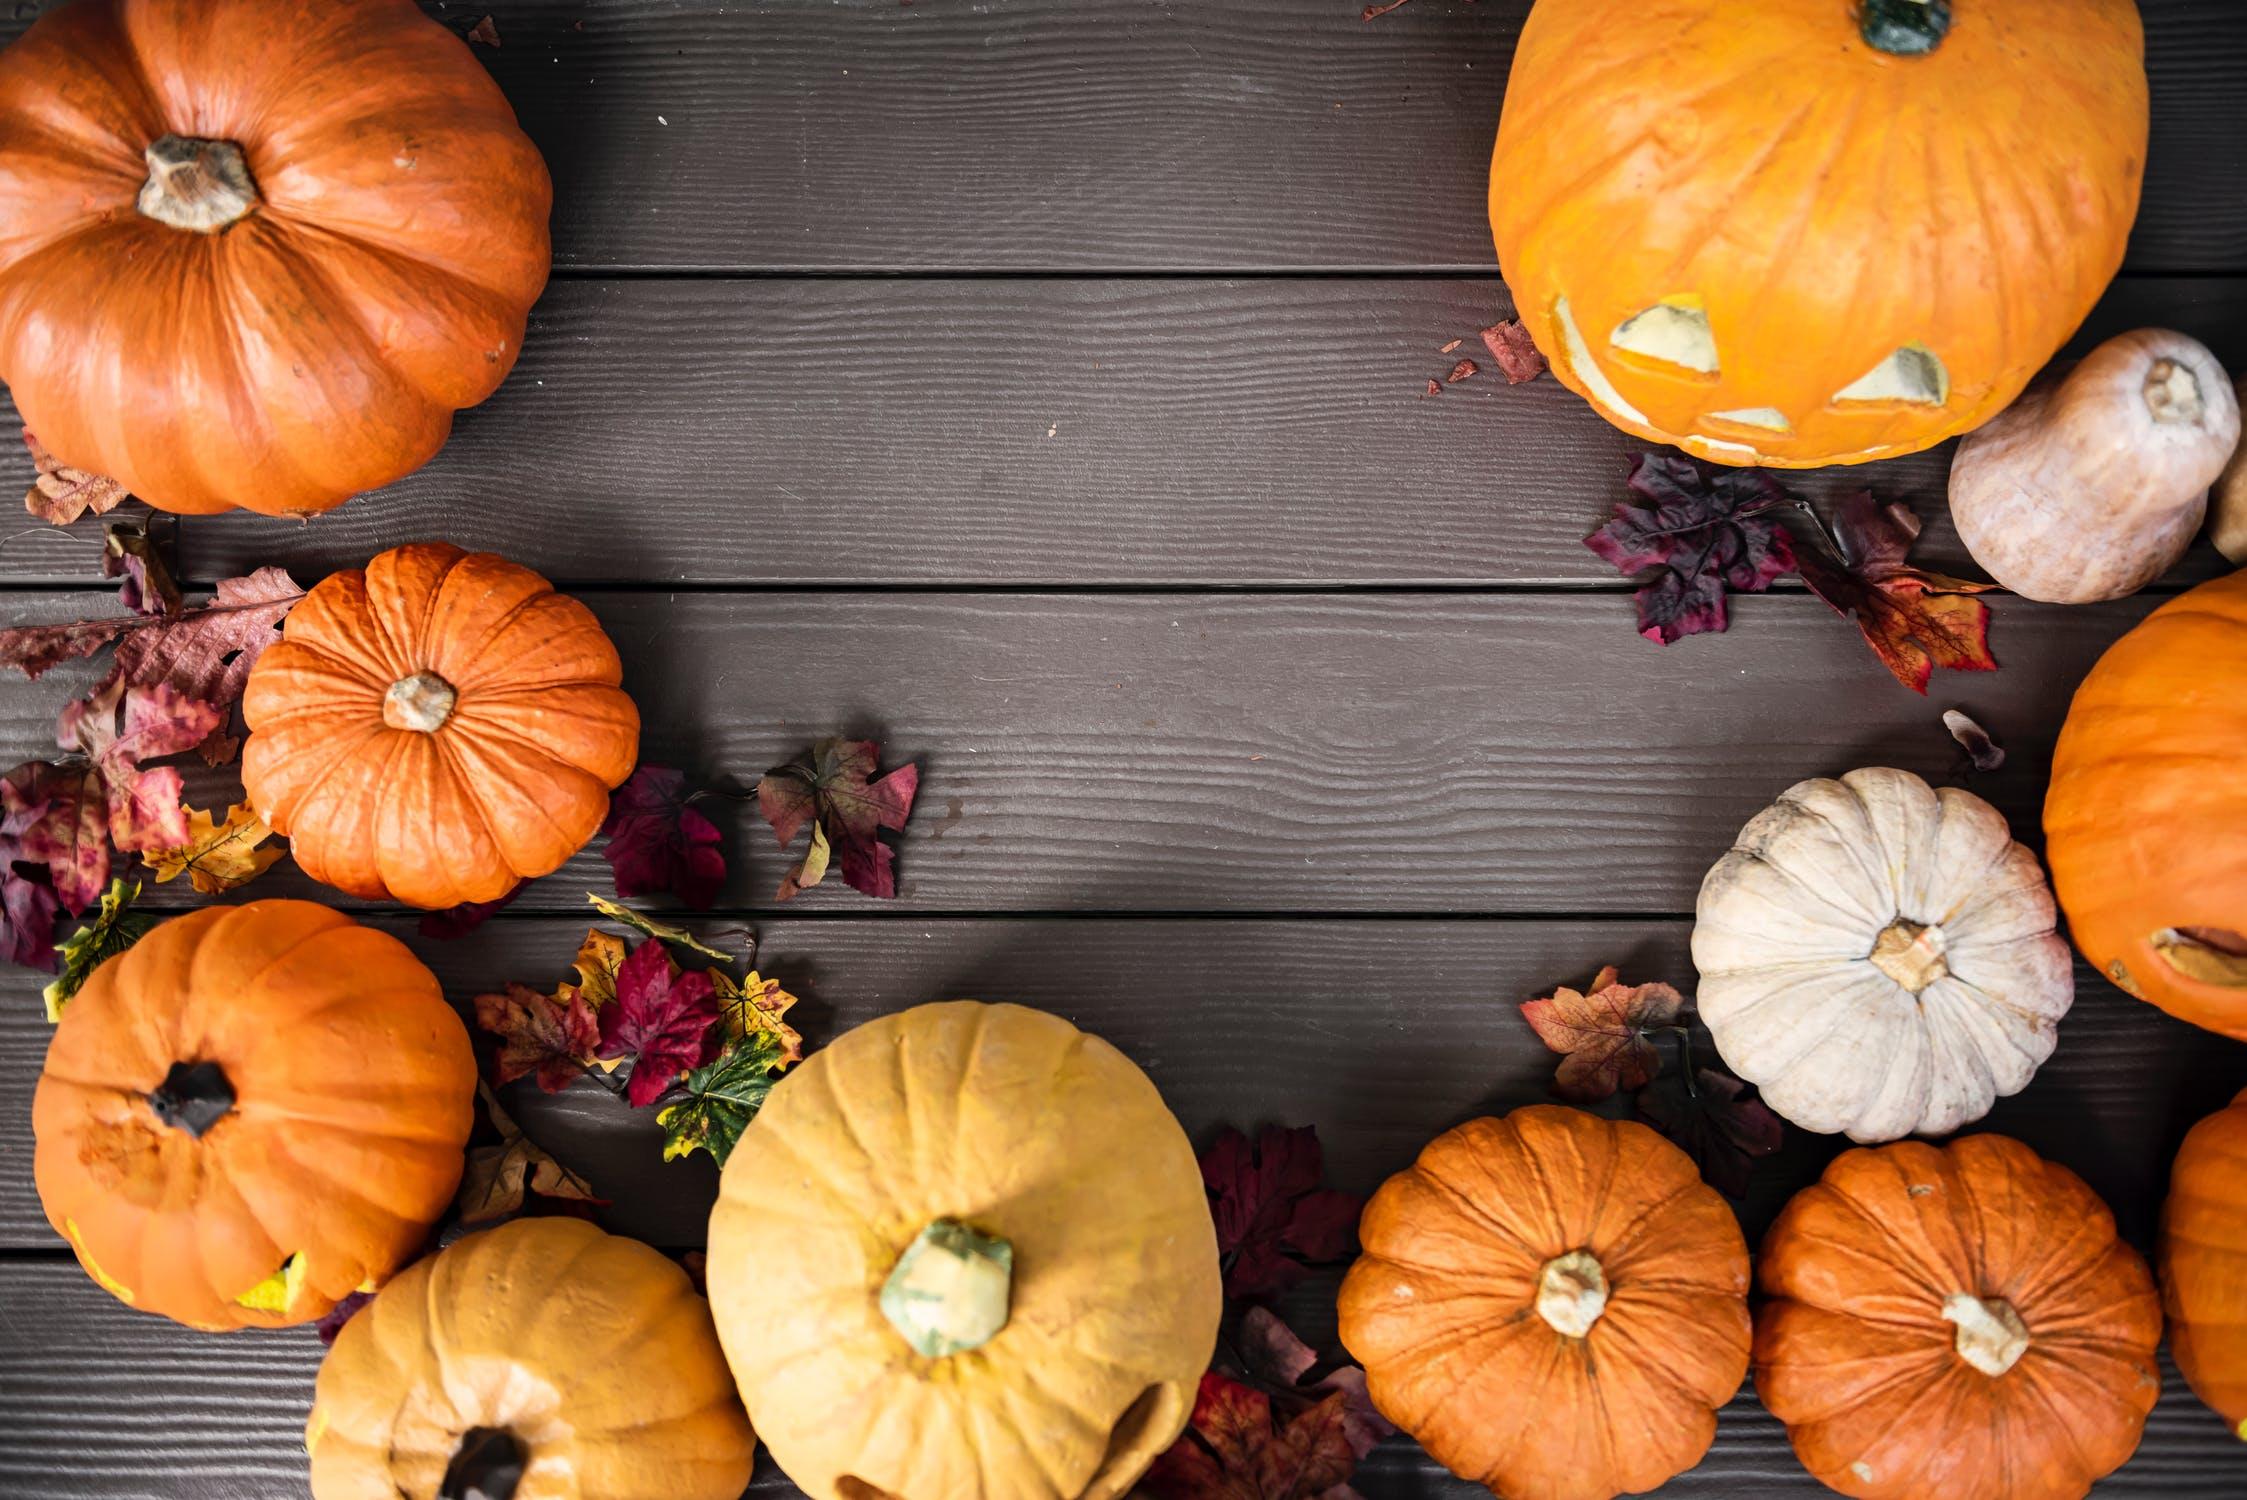 NOVEMBER 14. 2018 - The incredible, versatile pumpkin